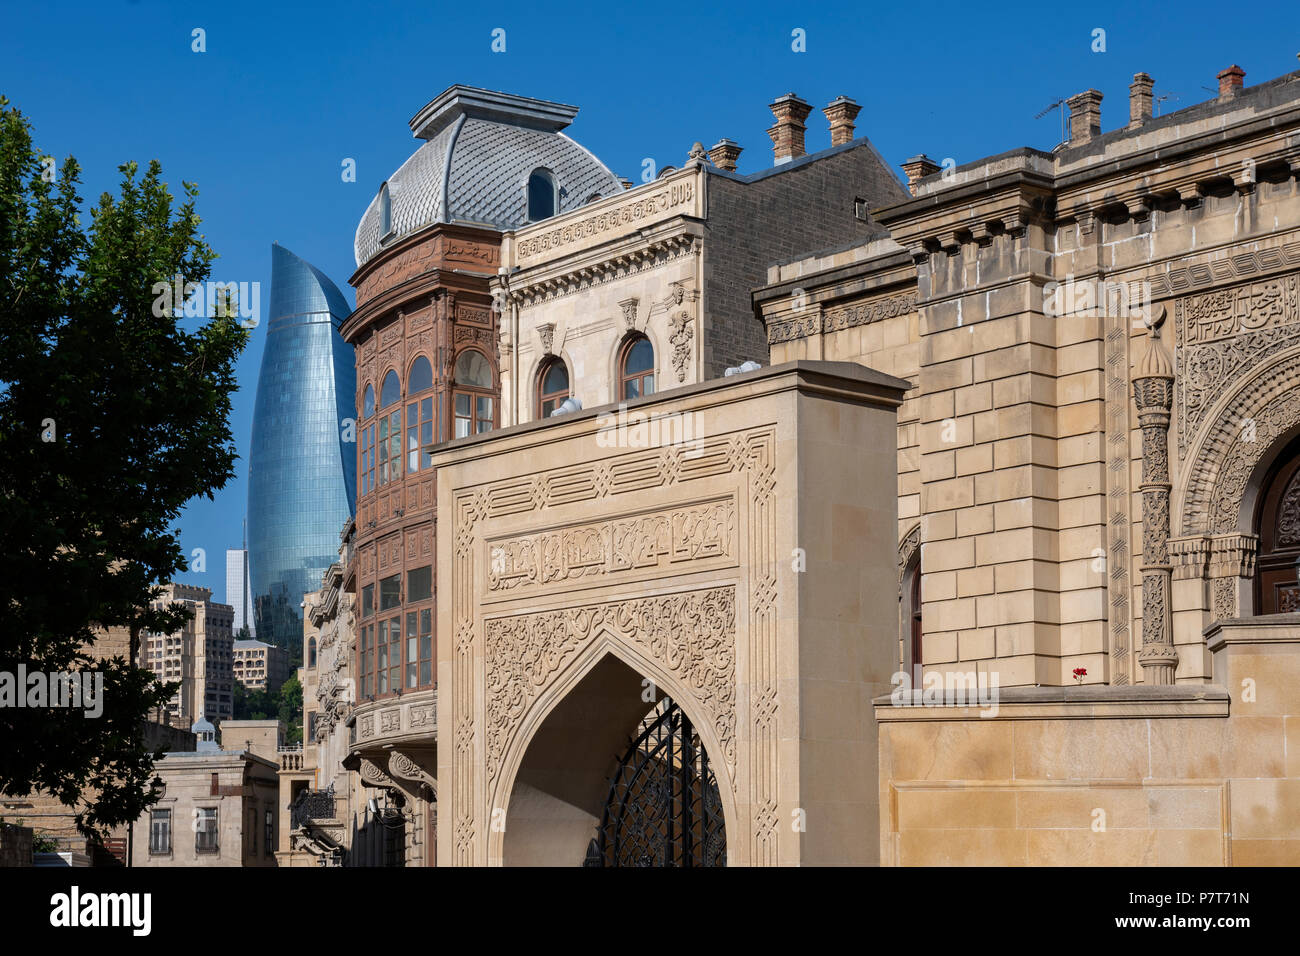 Juma Mosque and Flam Towers in Icheri Sheher, Ichari Shahar, Inside the Old City of Baku ,Azerbaijan - Stock Image